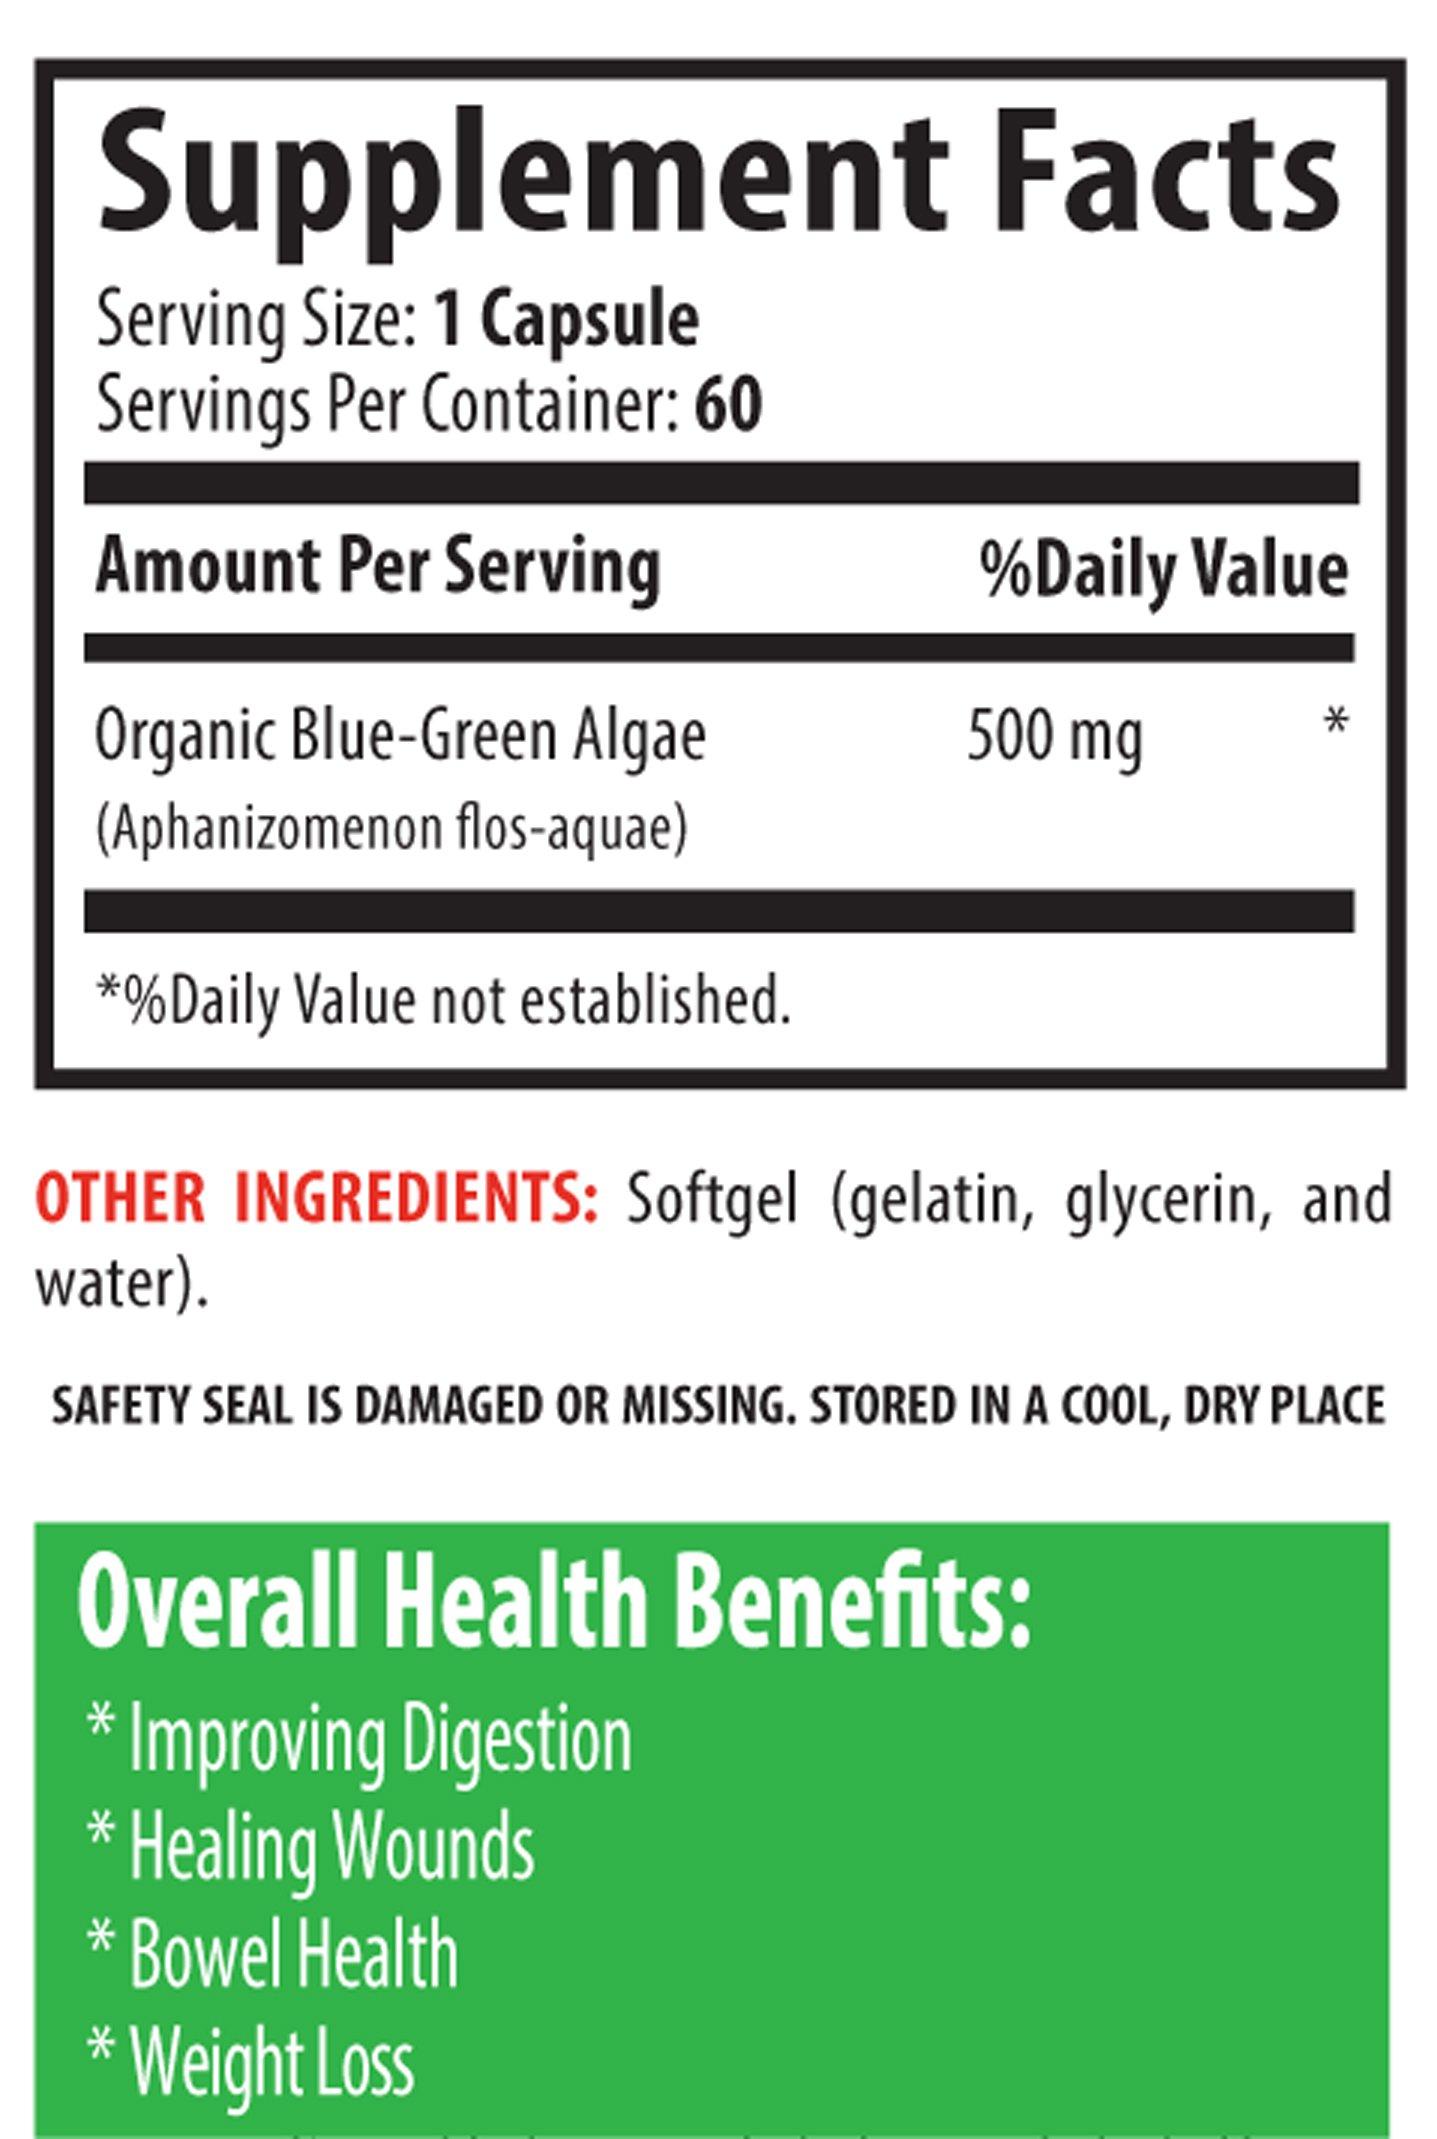 Premium Immune System and Energy Level Natural Antioxidant - Klamath Blue Green Algae 500mg (6 Bottles 360 Capsules)